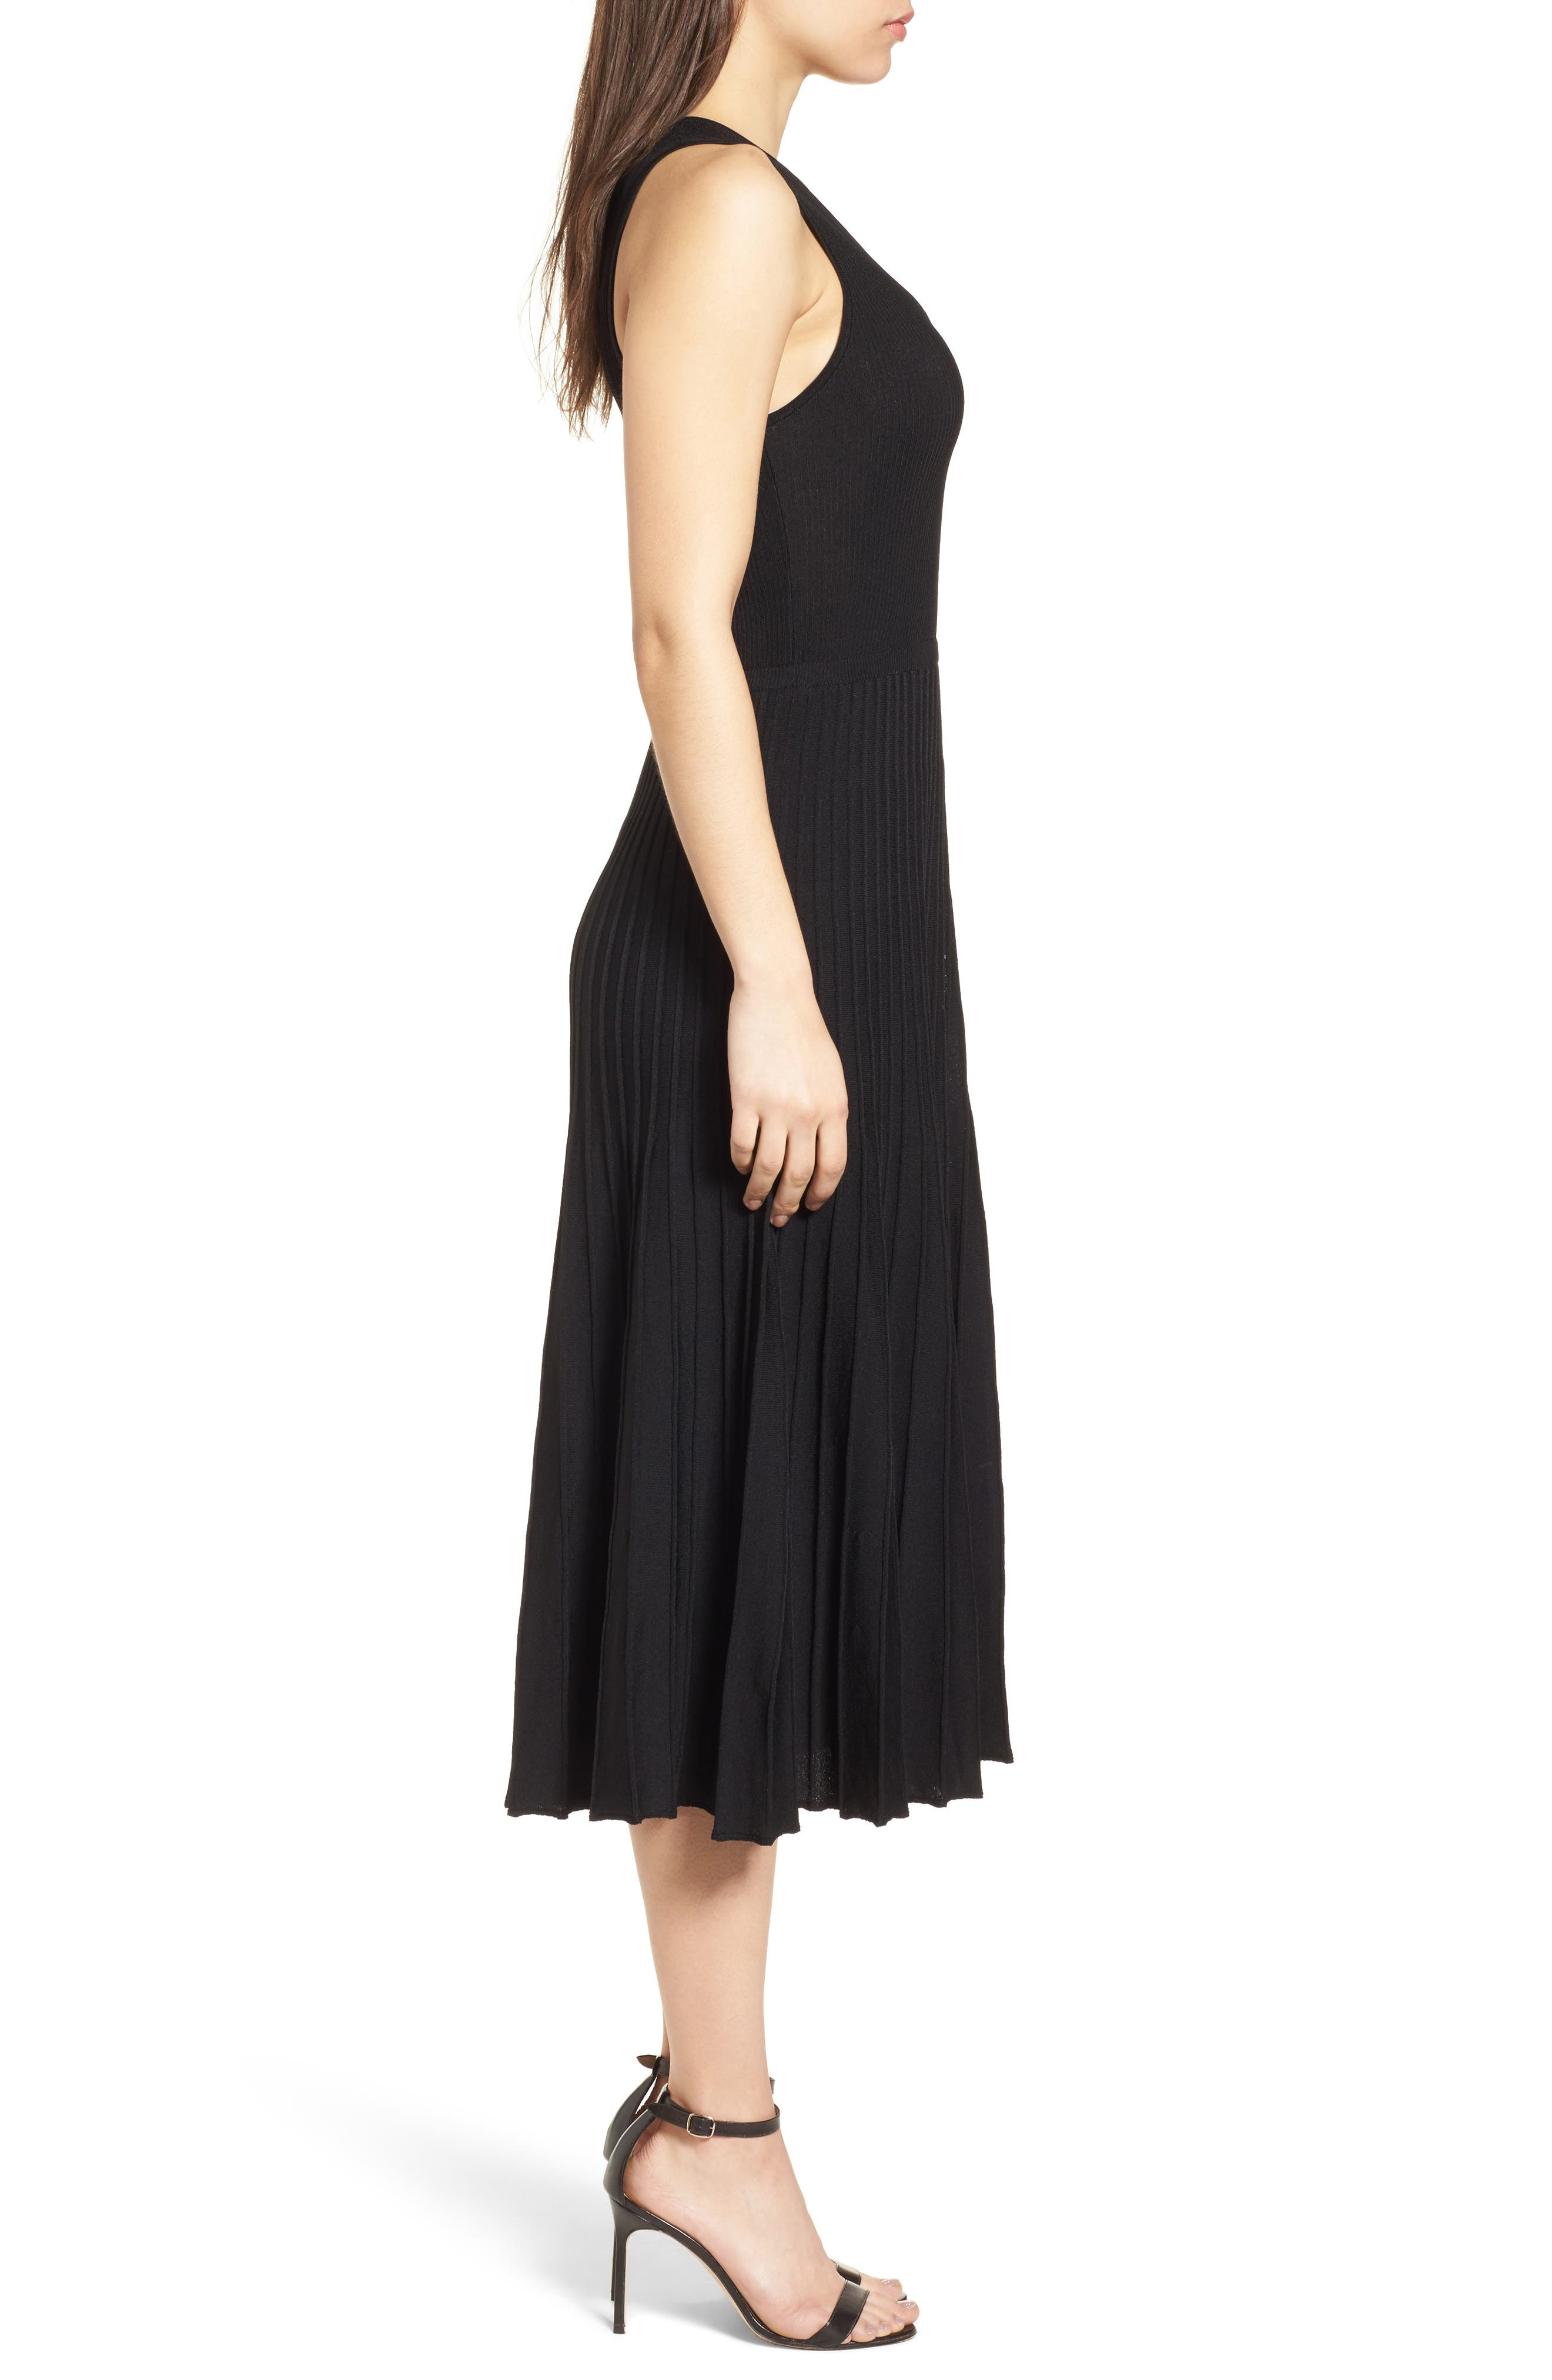 New York Pleated Sweater Midi Dress,                             Alternate thumbnail 3, color,                             Black